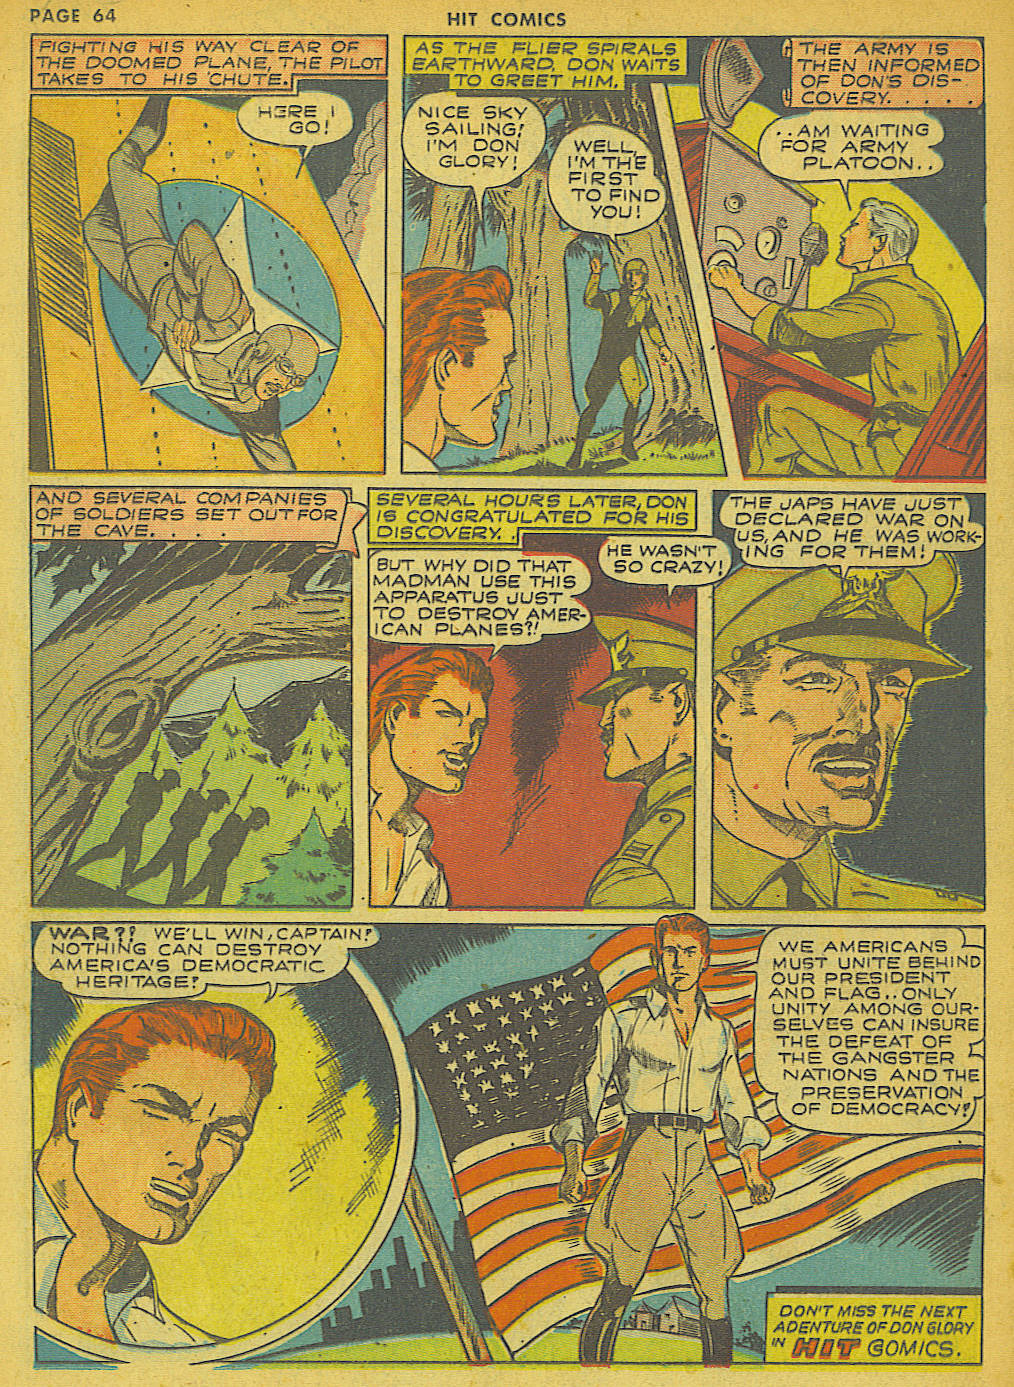 Read online Hit Comics comic -  Issue #21 - 66